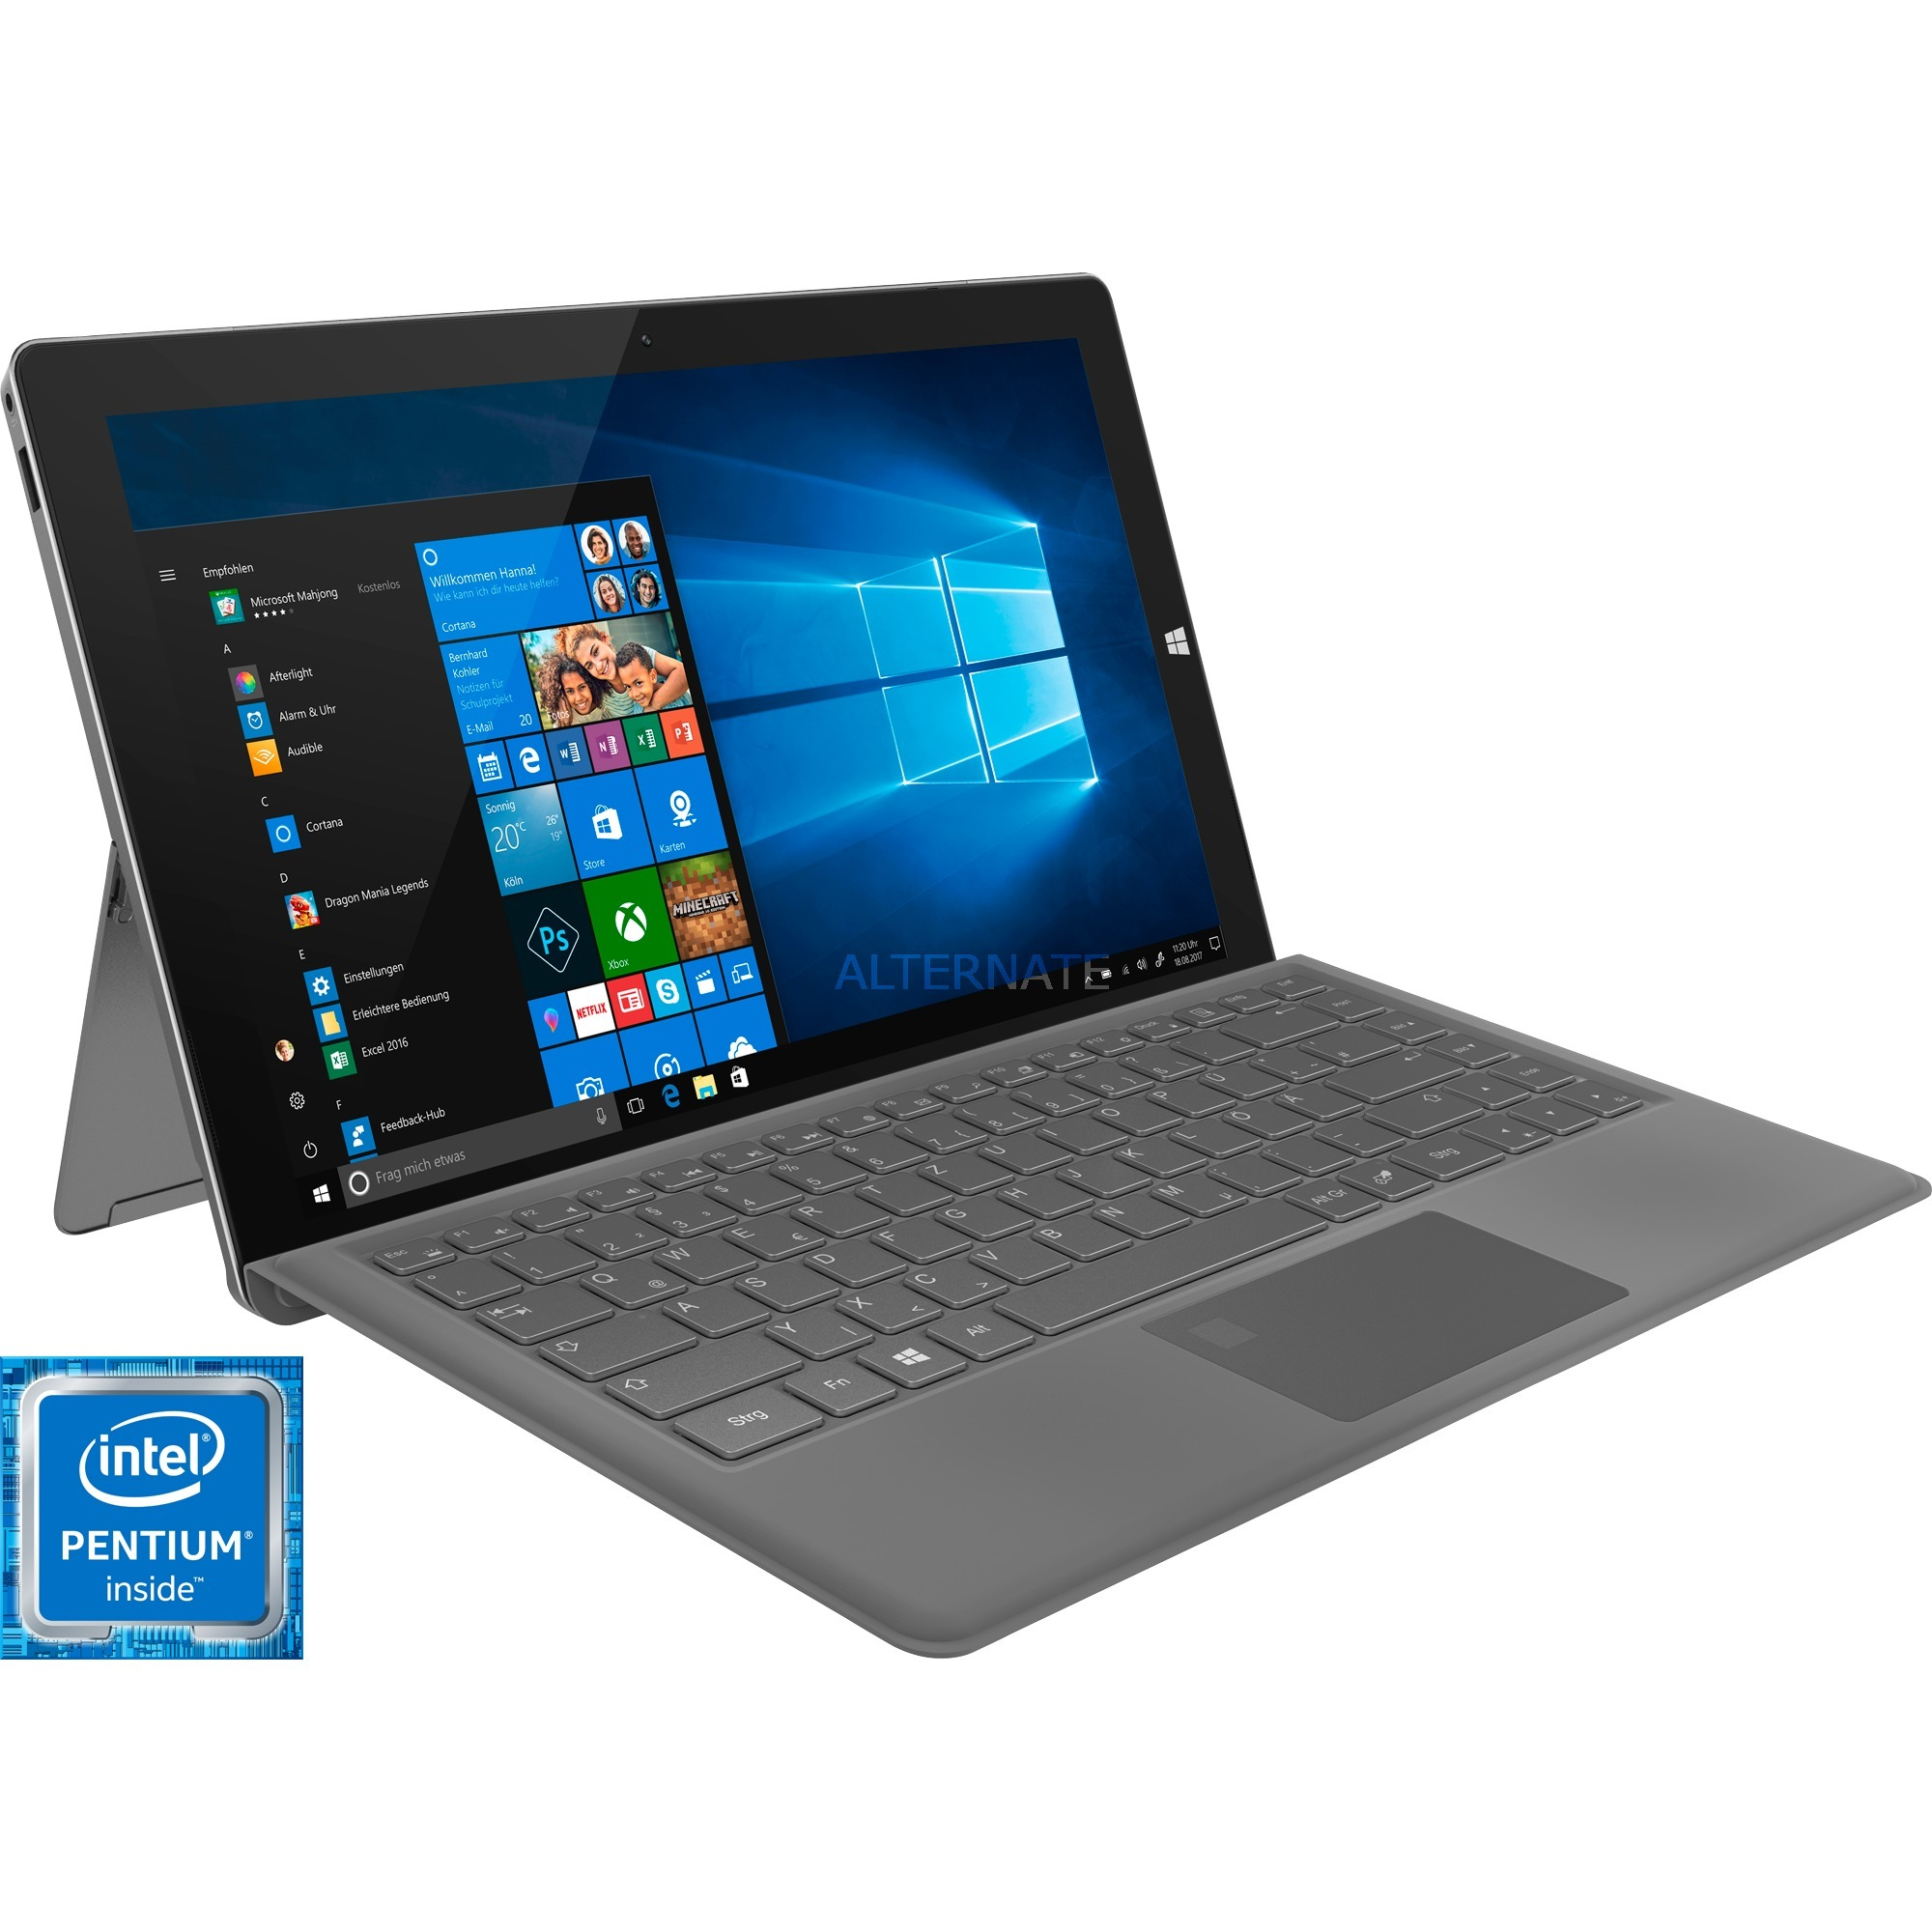 "T13B-PO Negro, Gris Híbrido (2-en-1) 33,8 cm (13.3"") 1920 x 1080 Pixeles Pantalla táctil 1,10 GHz Intel Pentium N4200, Tablet PC"